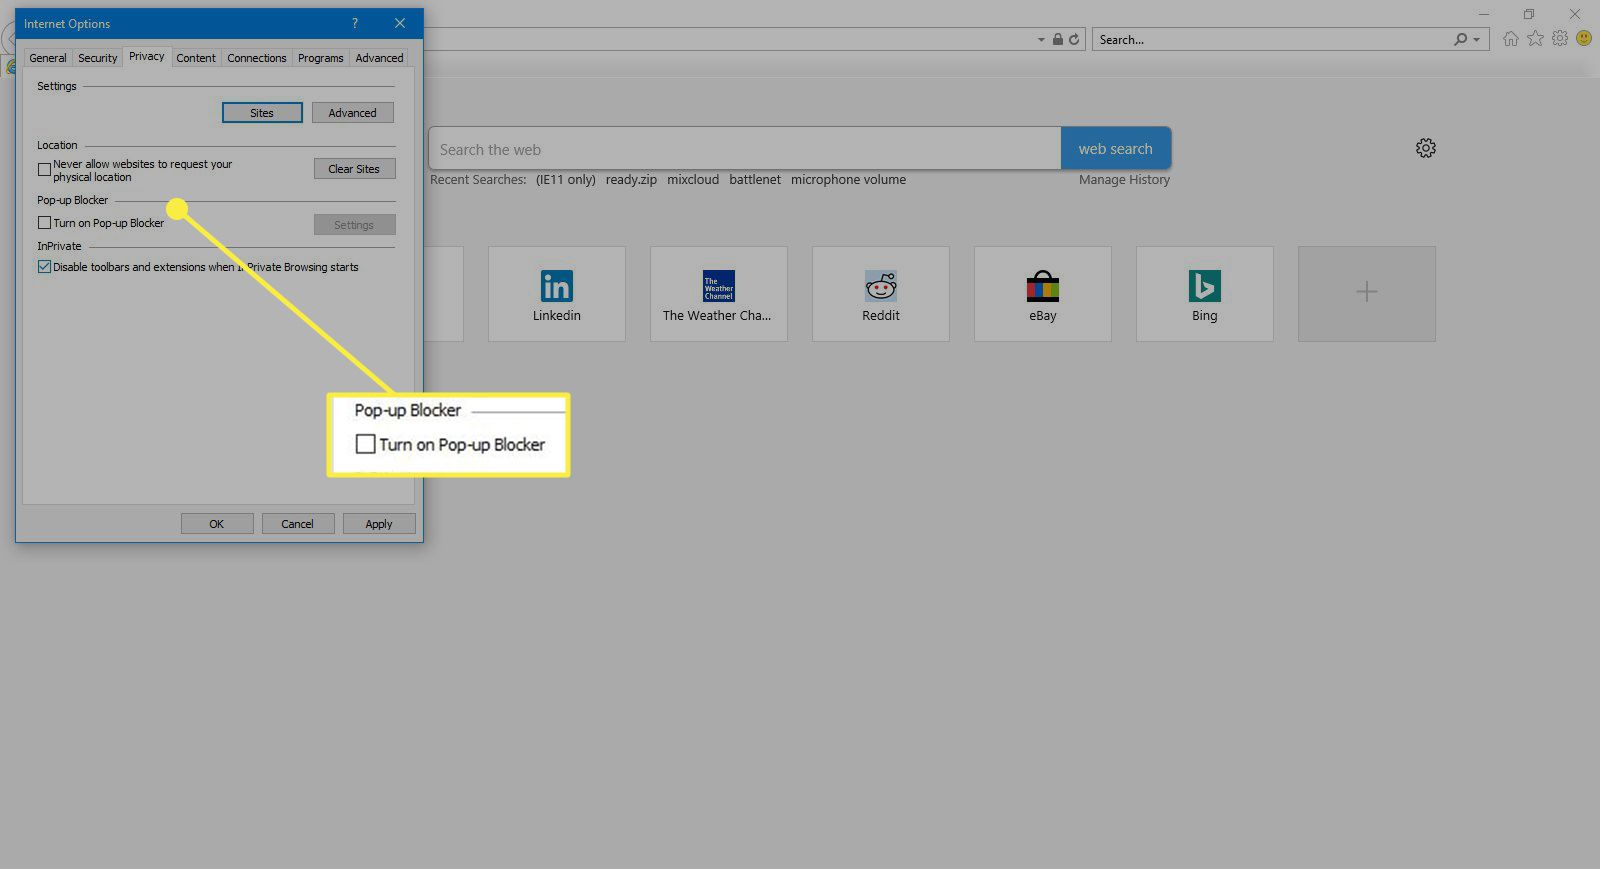 The Pop-Up Blocker settings in Internet Explorer